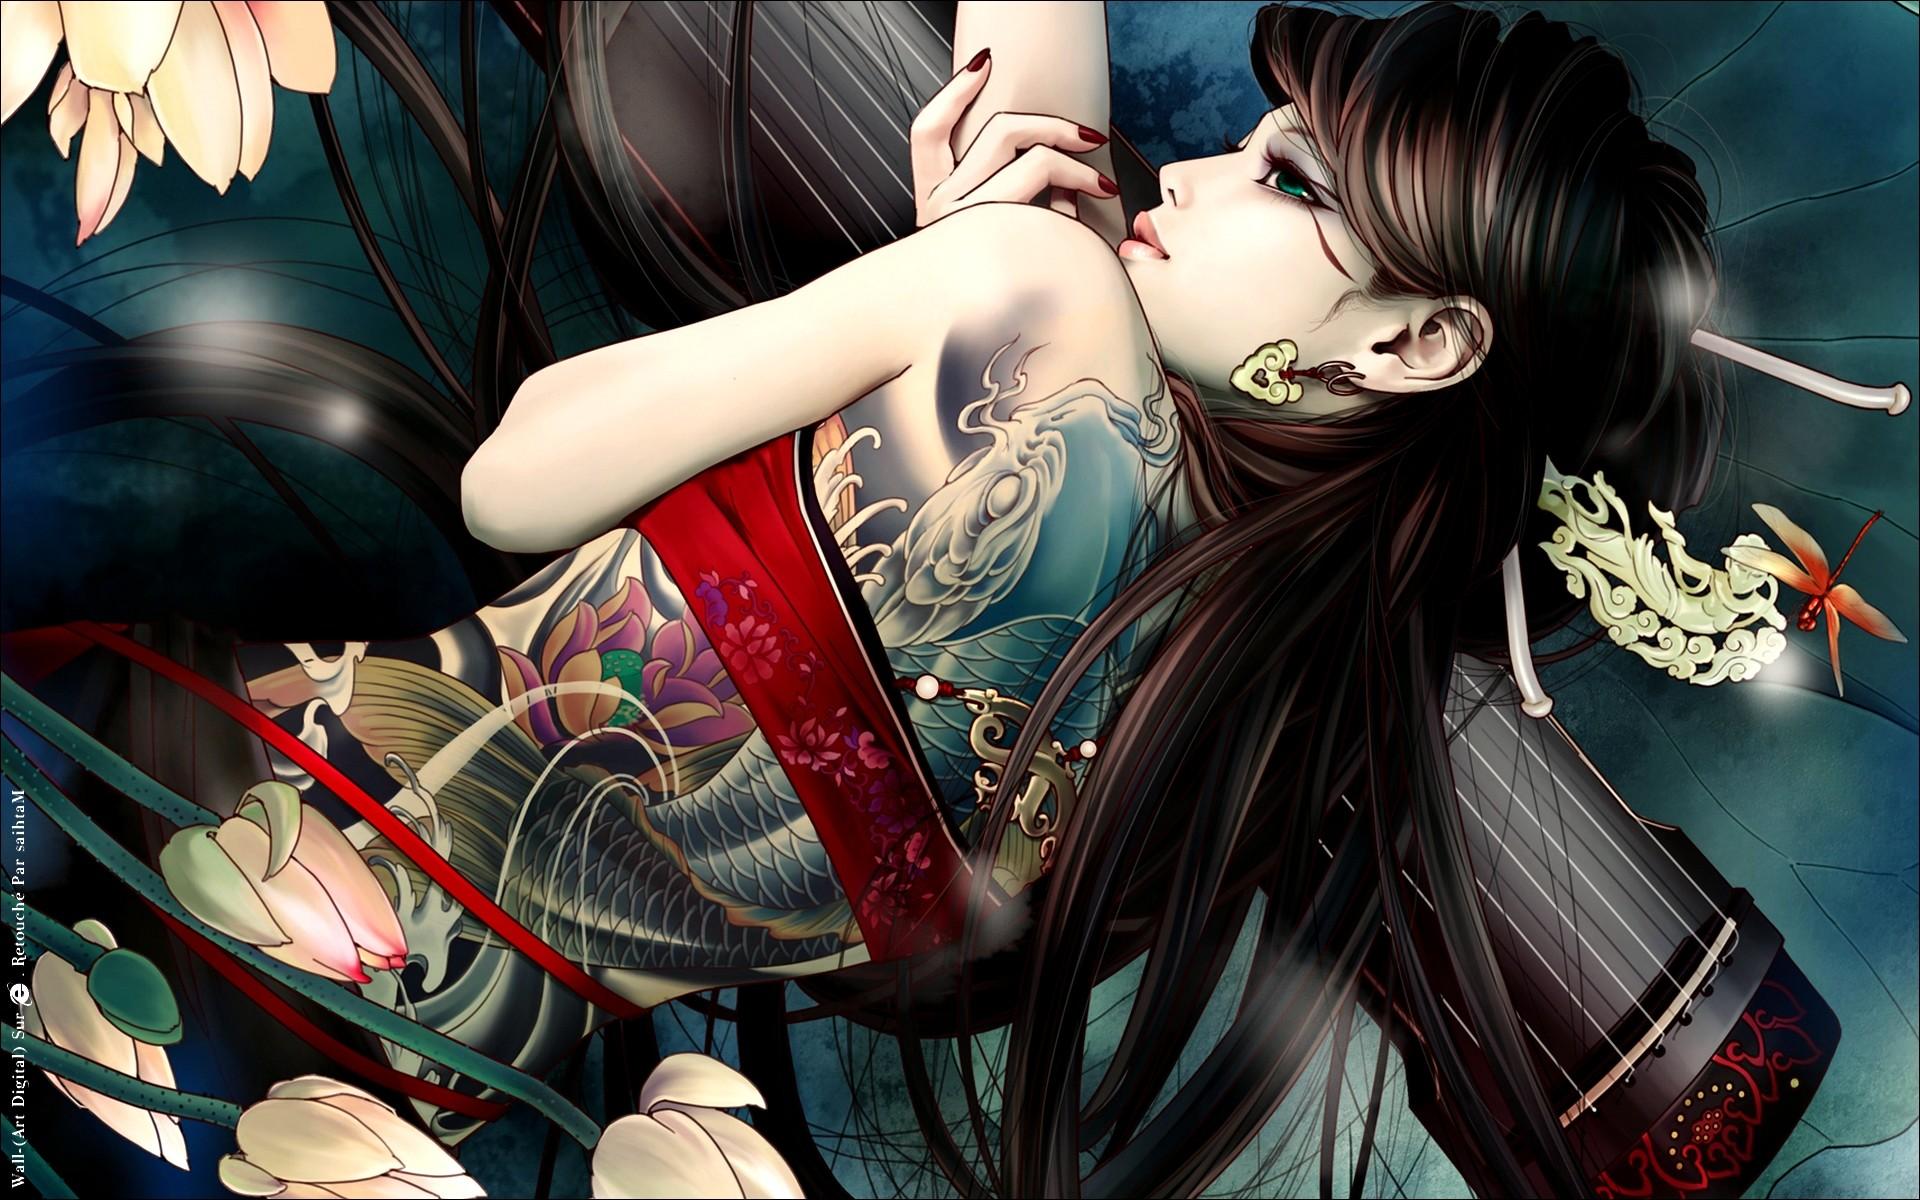 Beautiful Cool Girl Back Tattoo Anime HD Wallpaper Desktop PC Background  1803